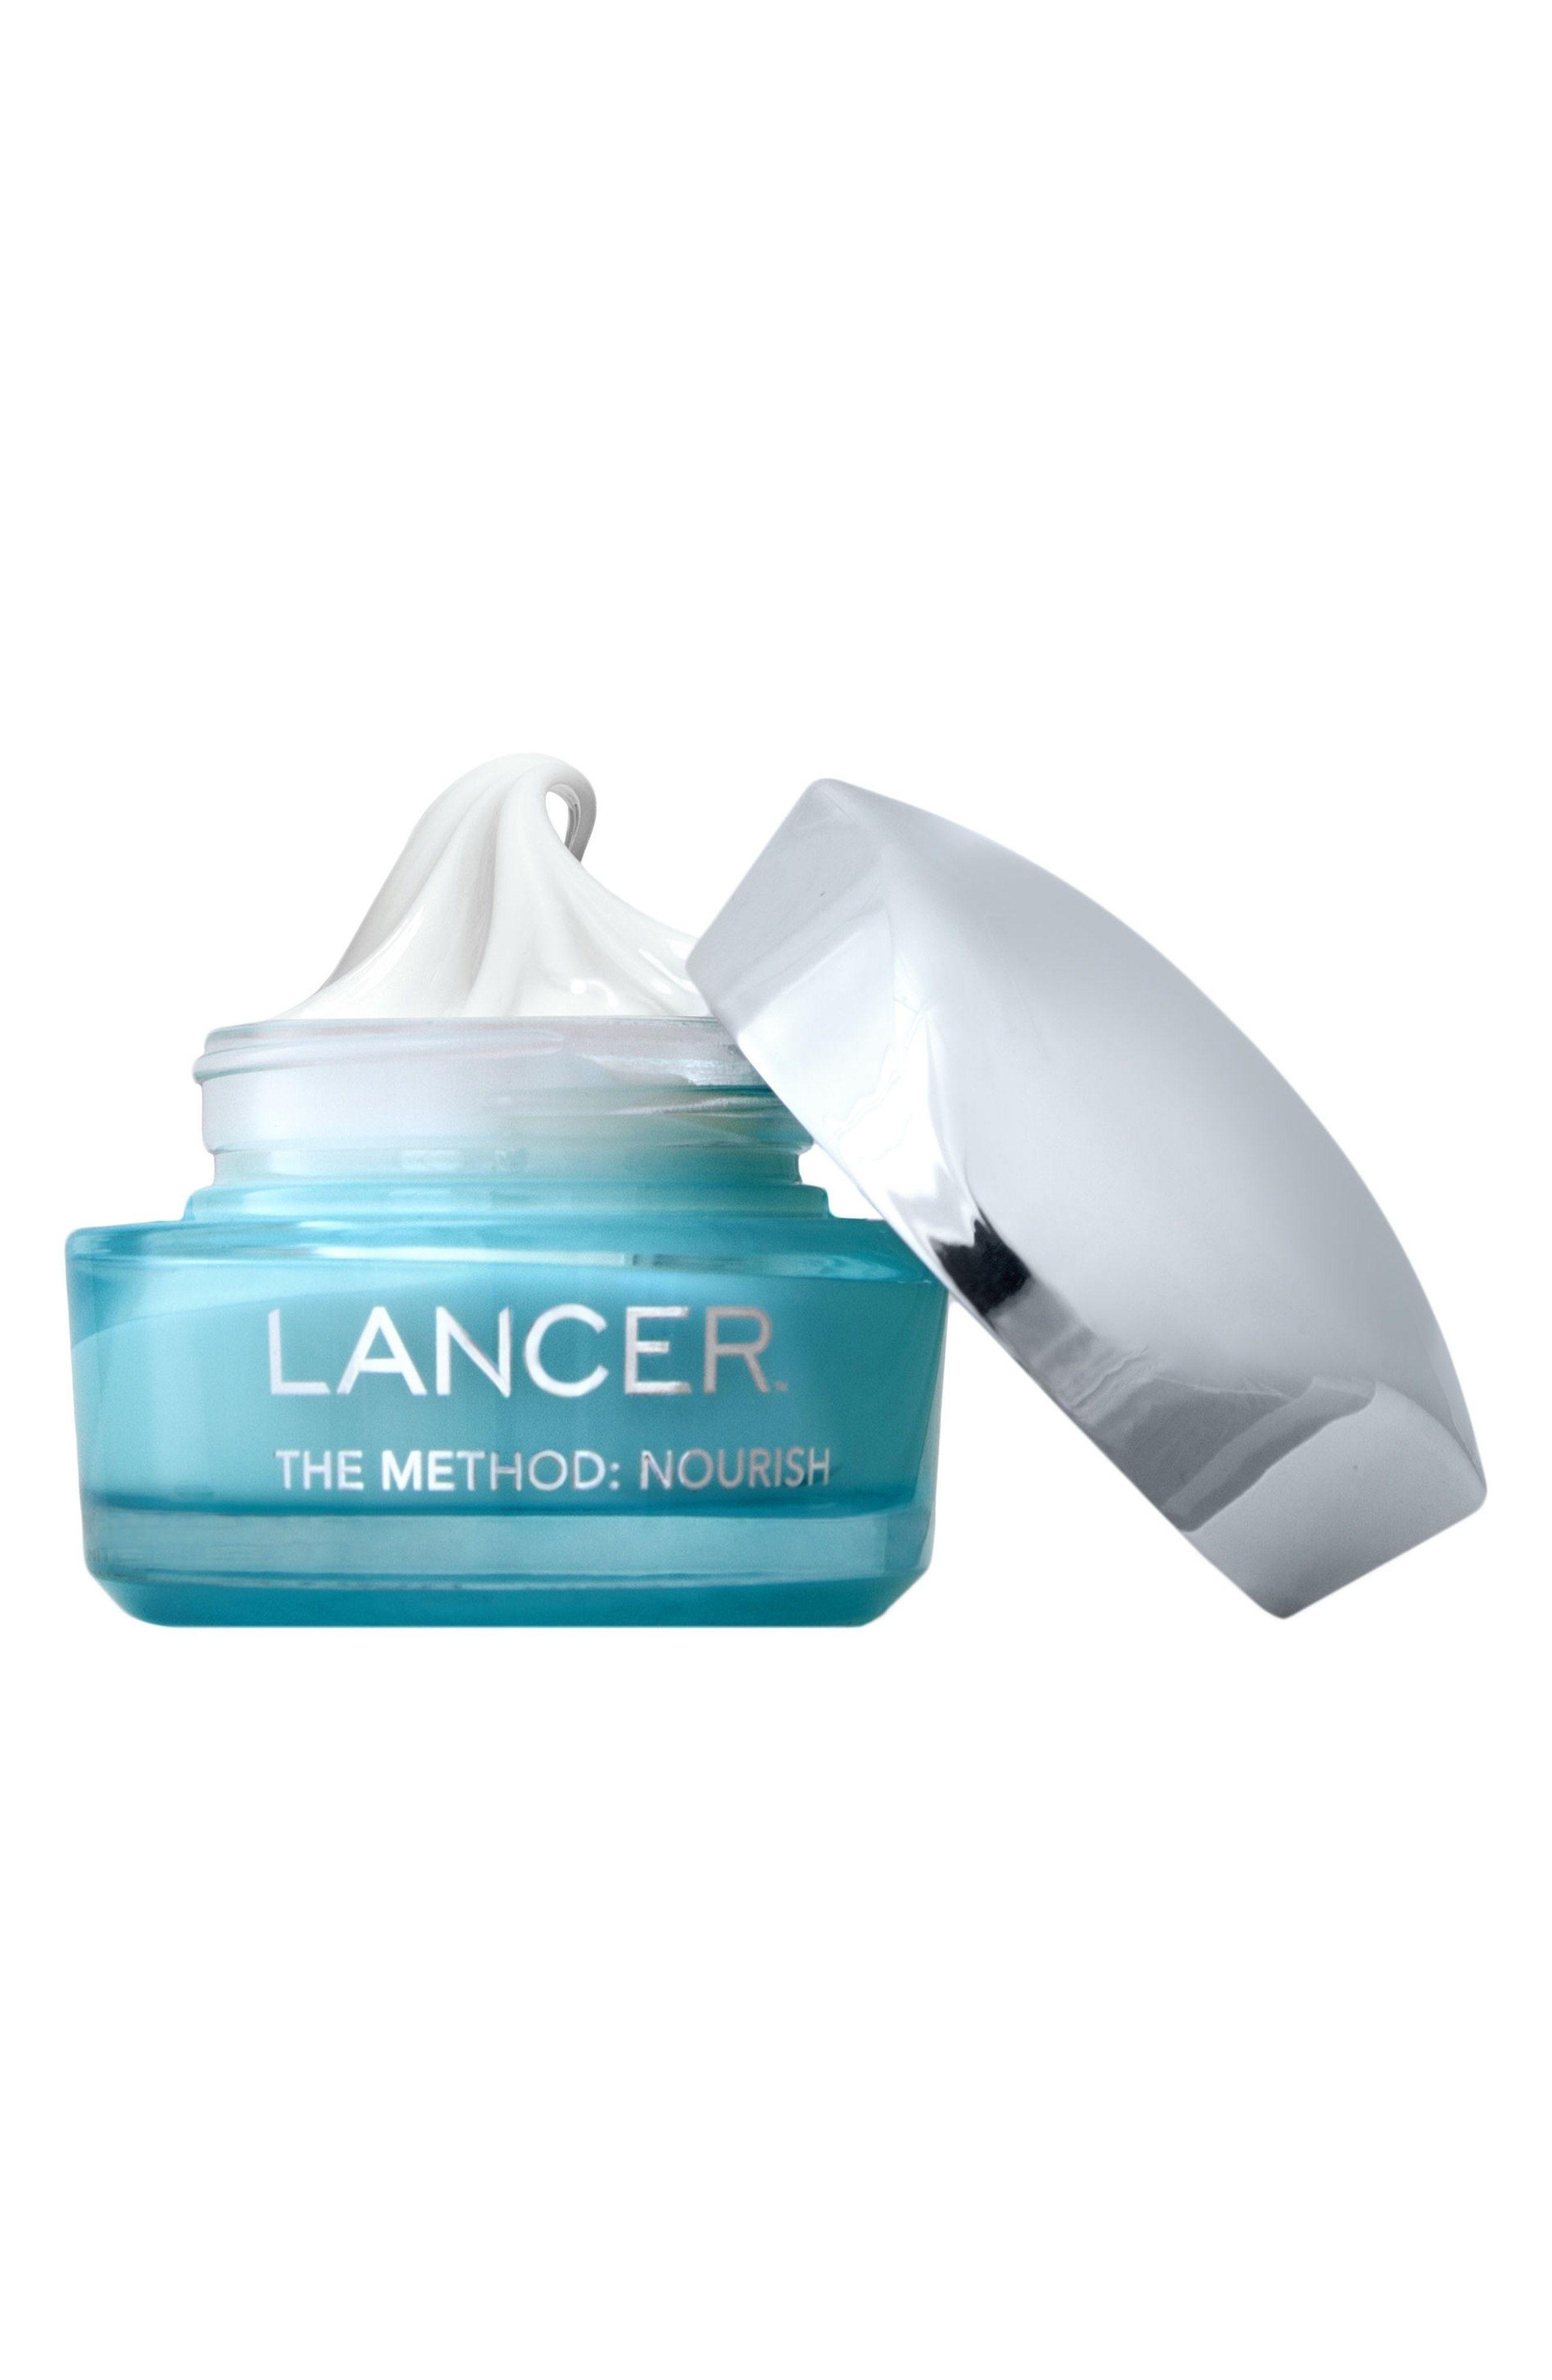 New Lancer Skincare The Method Nourish Moisturizer Fashion Online 125 Newtopfashion Top Lancer Skincare Skin Moisturizer Combination Skin